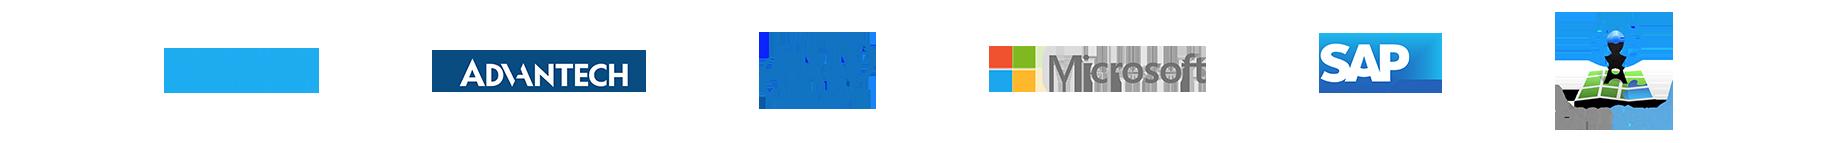 Logos-Marketbound.png